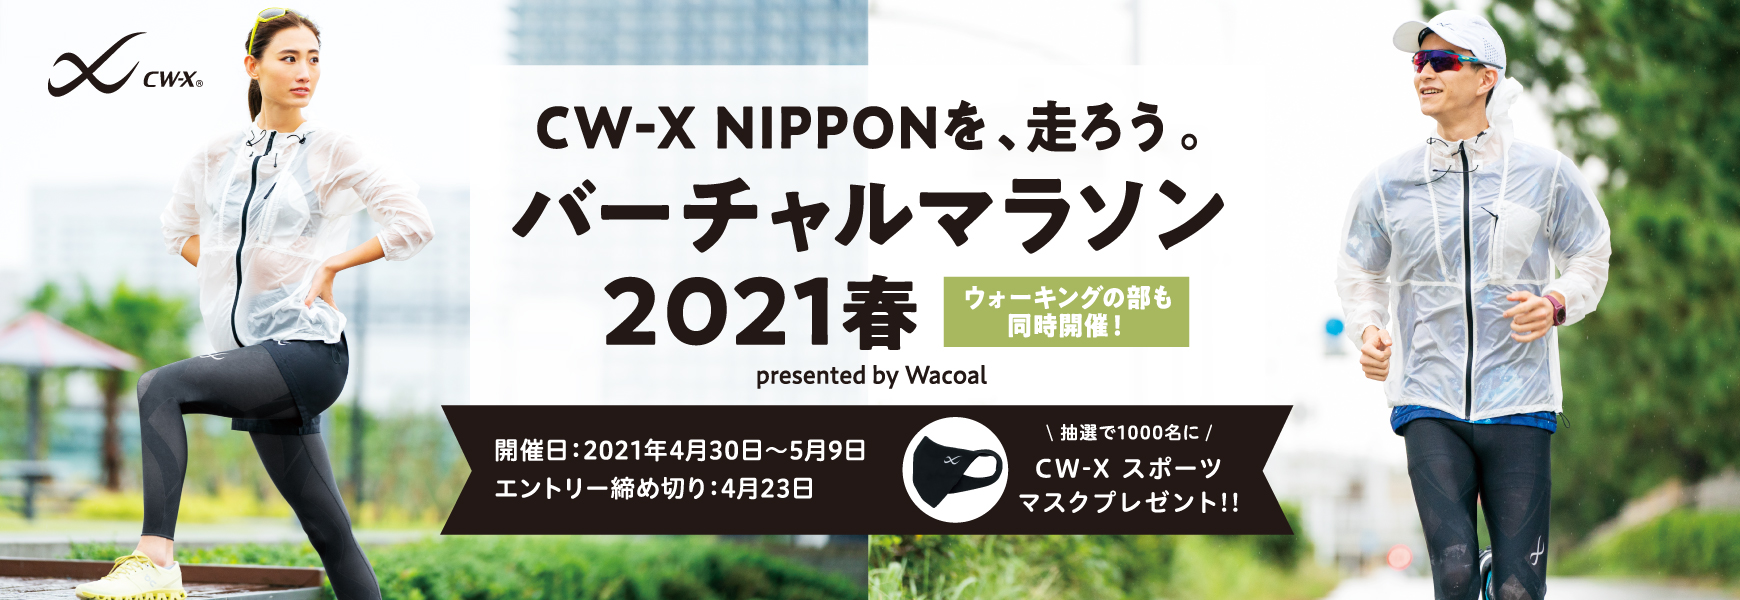 CW-X NIPPONを、走ろう。バーチャルマラソン2021春 presented by wacoal【公式】